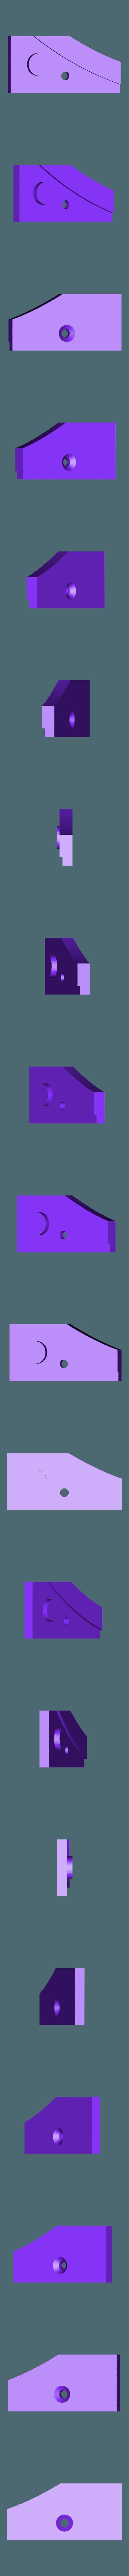 tighter_clamp_02_right.stl Télécharger fichier STL gratuit Kossel 220mm Hot Bed Spacers / Supports • Design pour imprimante 3D, peaberry